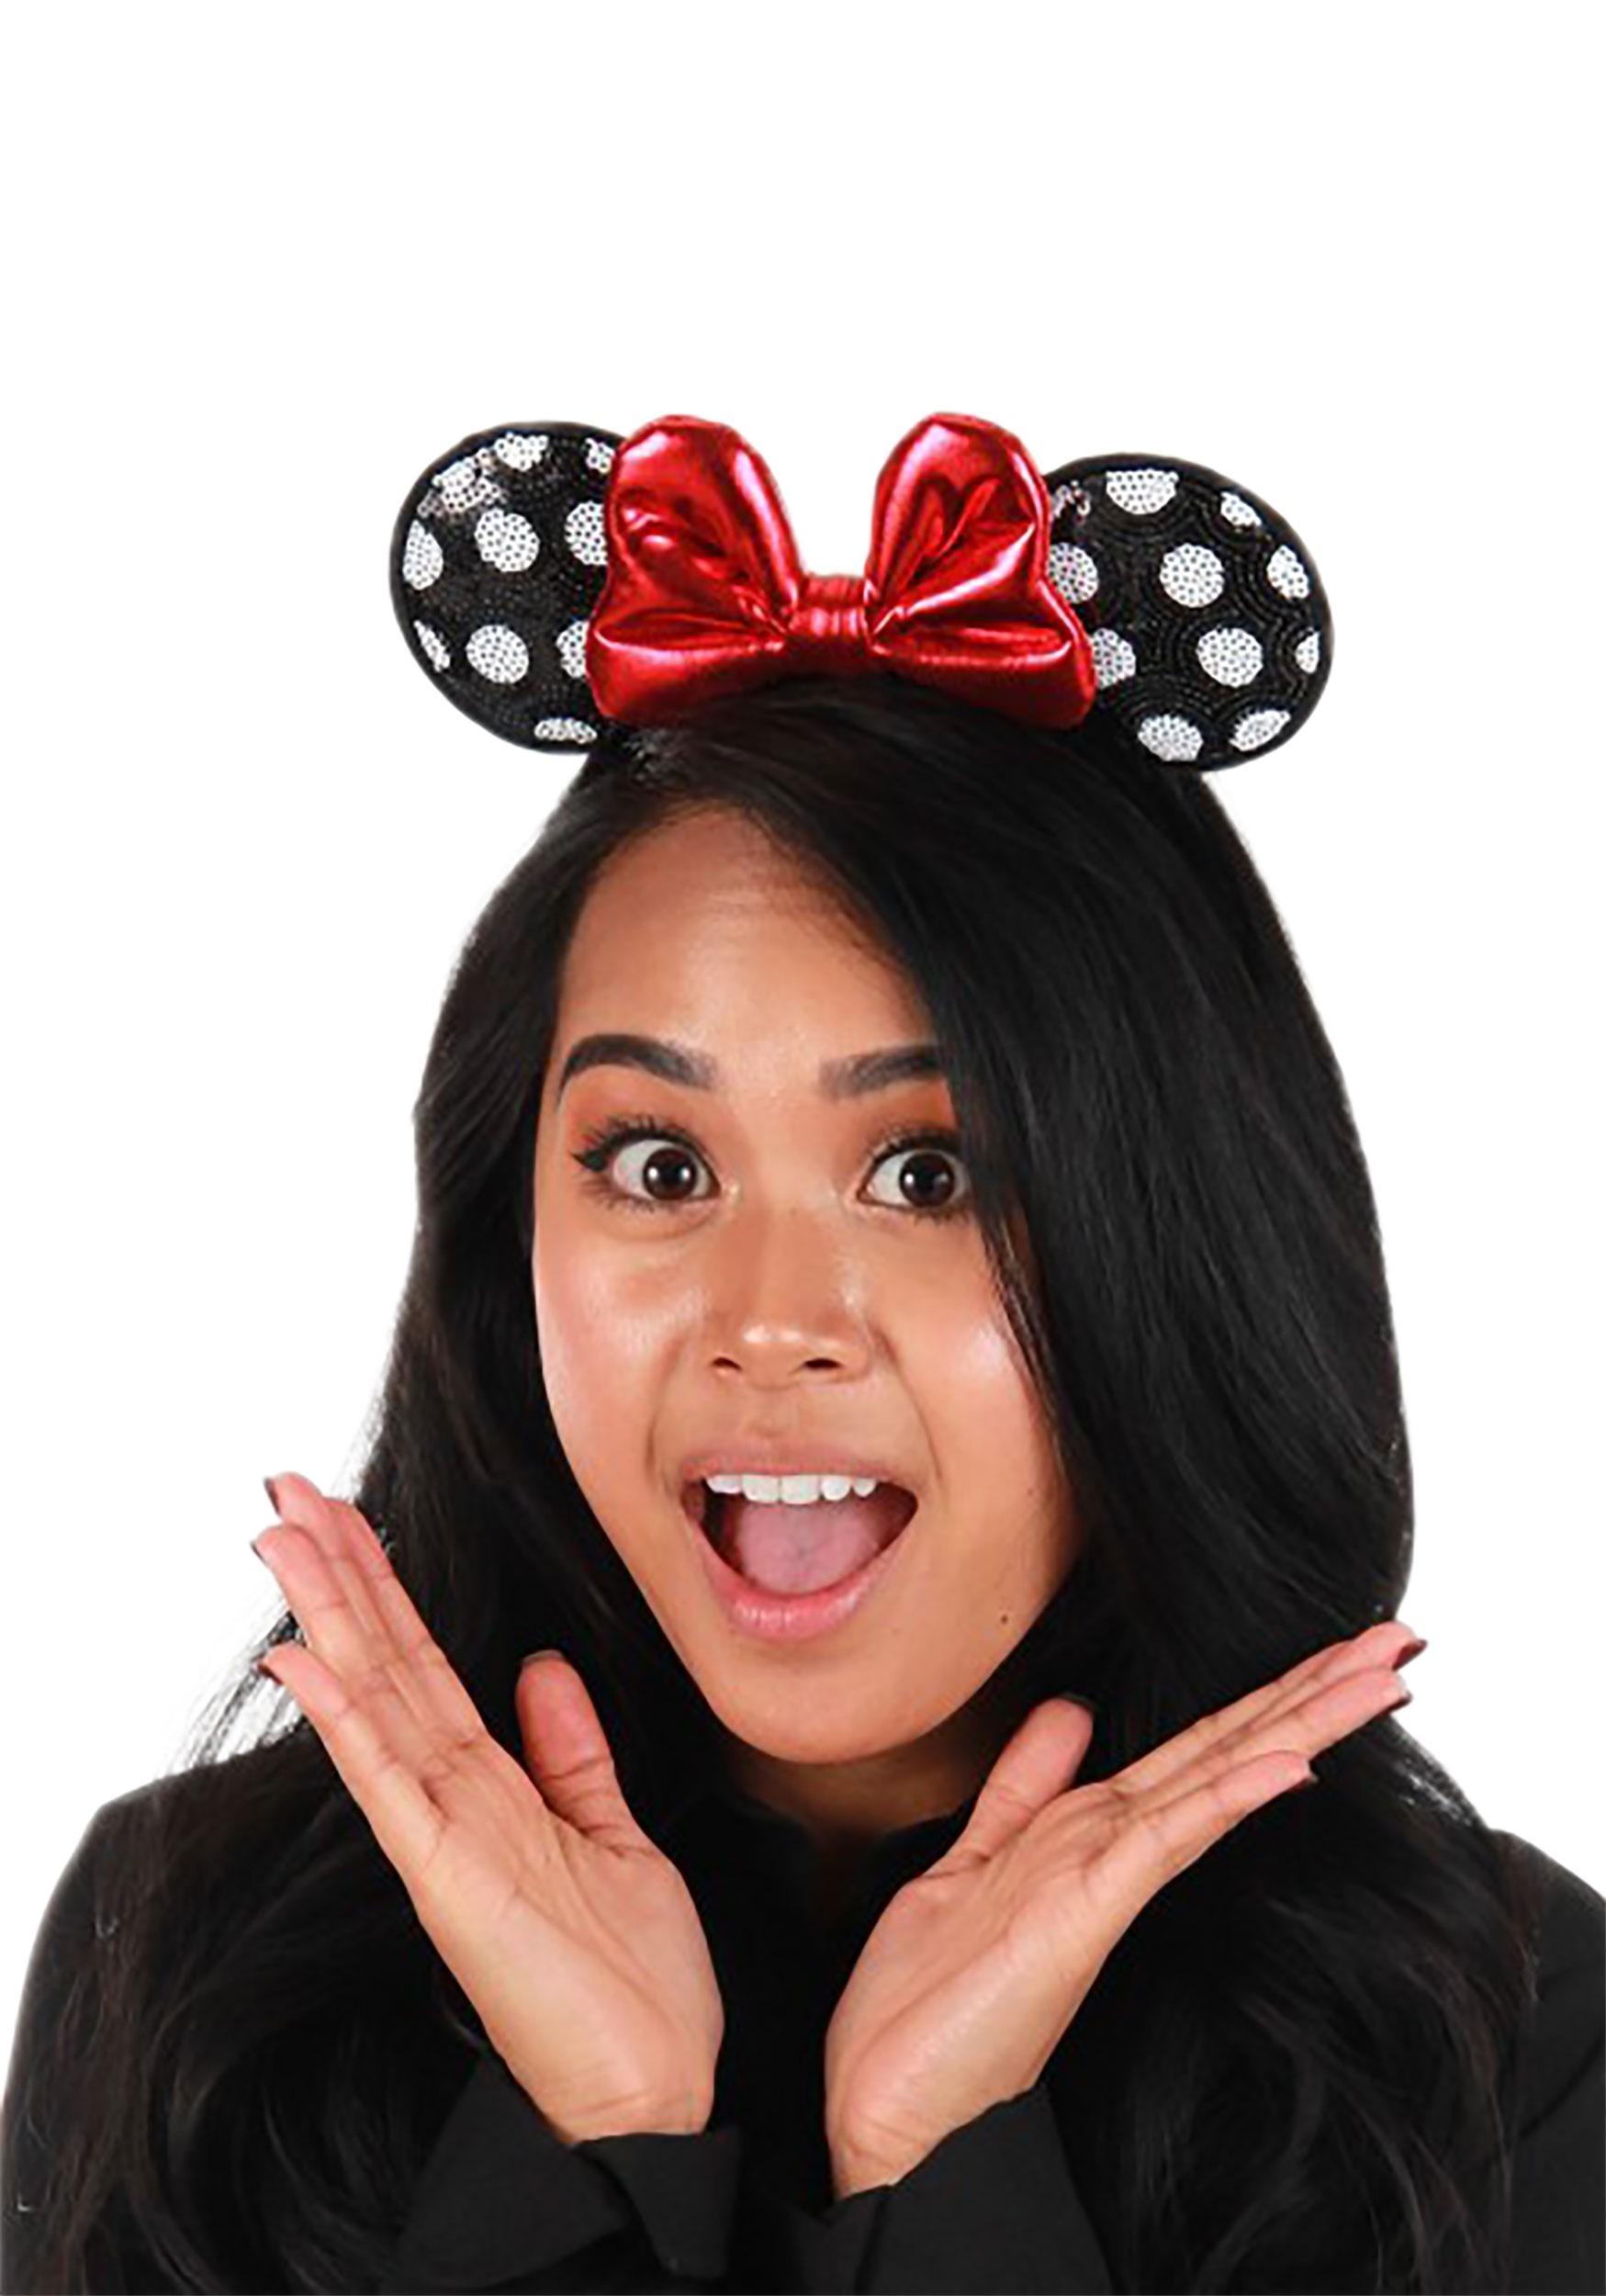 Minnie Mouse Polka Dot Sequined Ears Headband Accessory